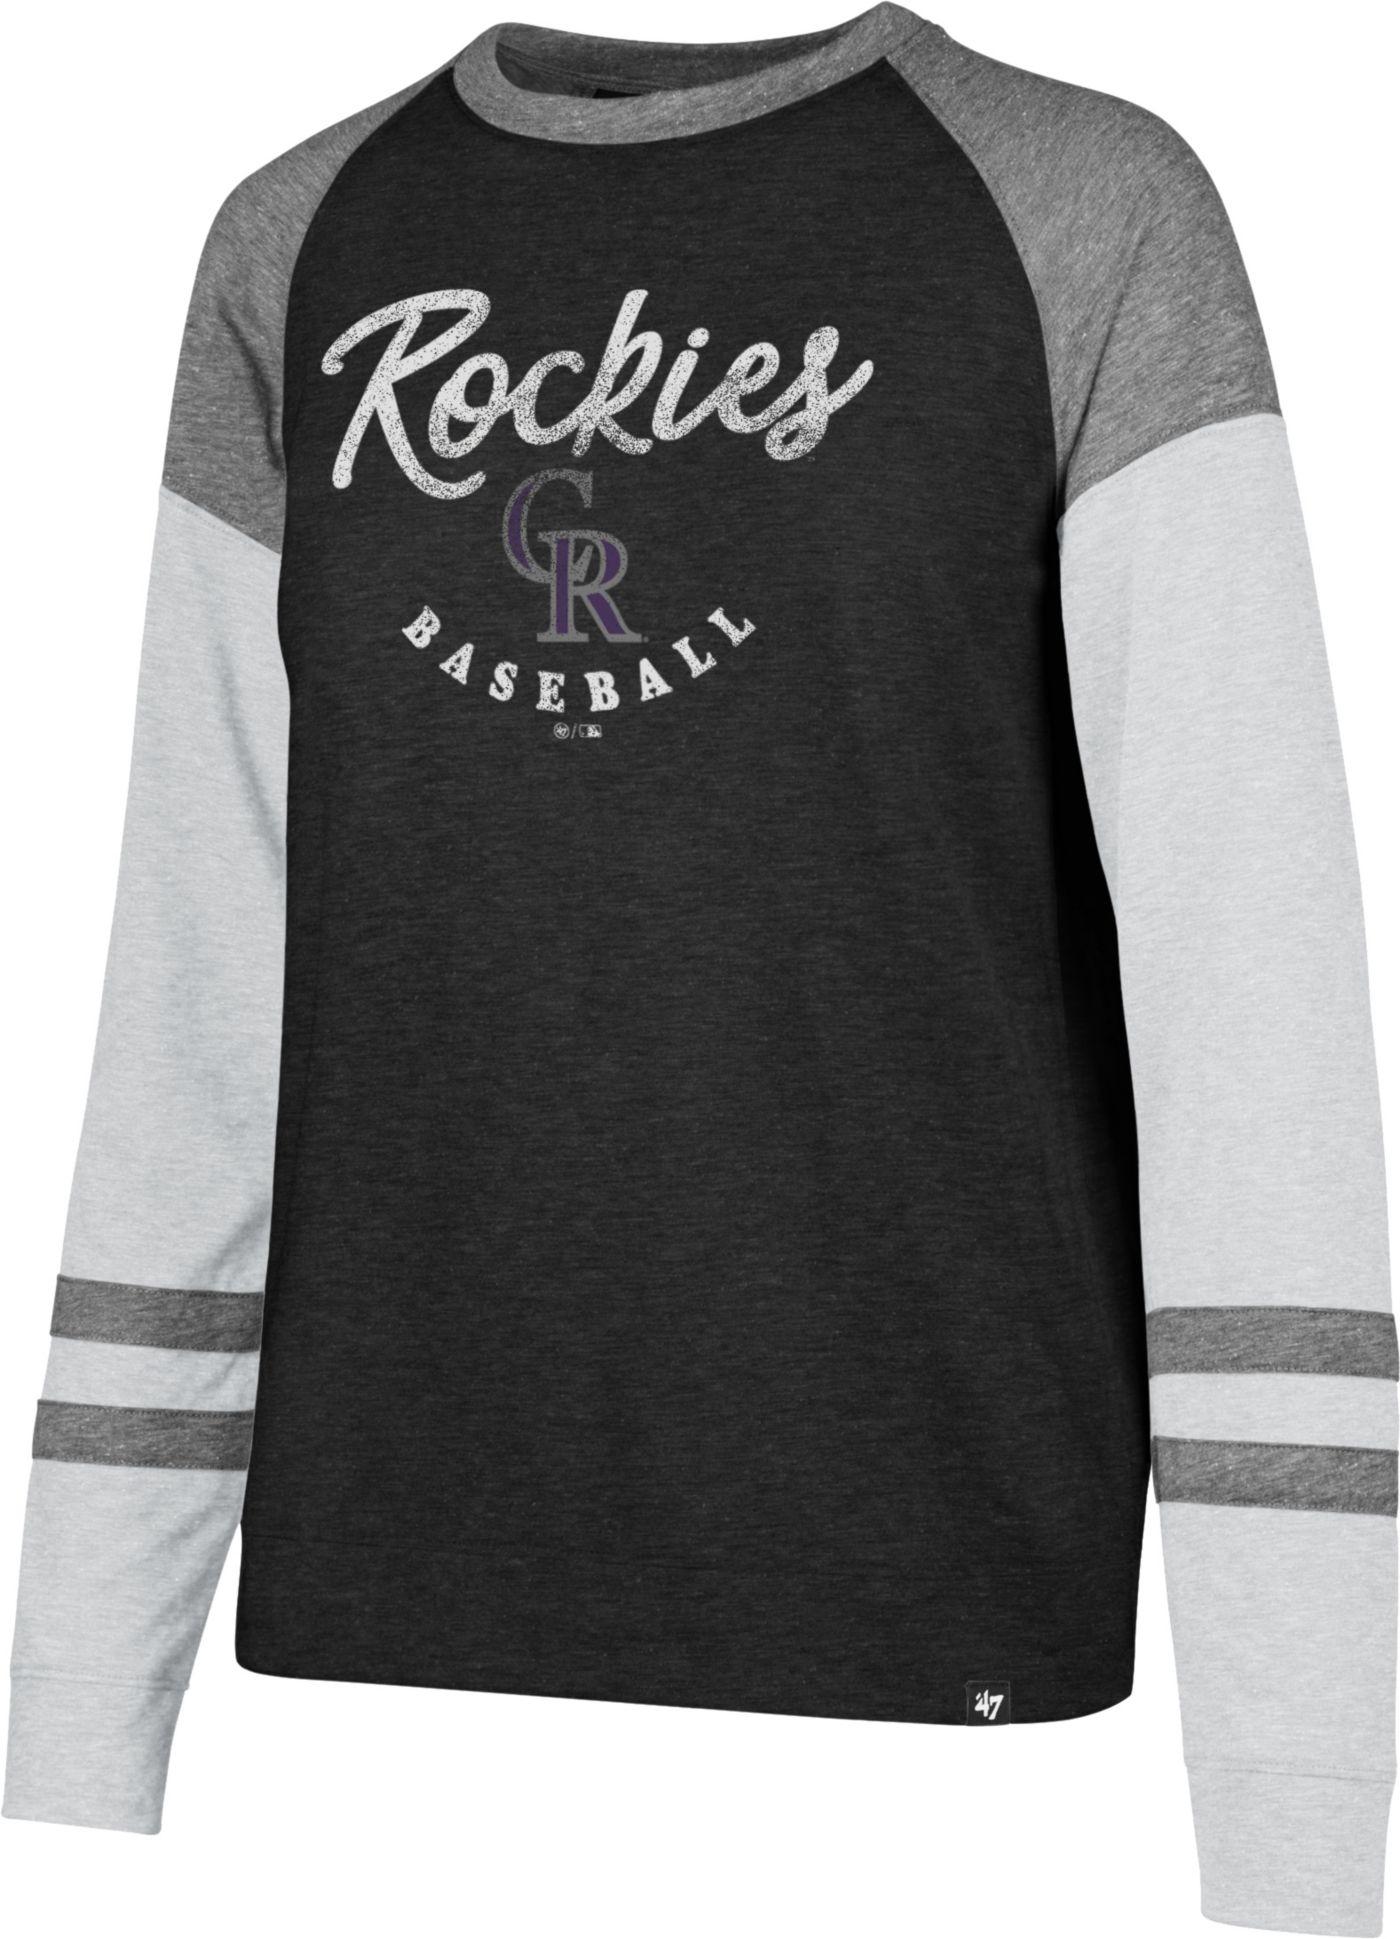 '47 Women's Colorado Rockies Match Long Sleeve Shirt